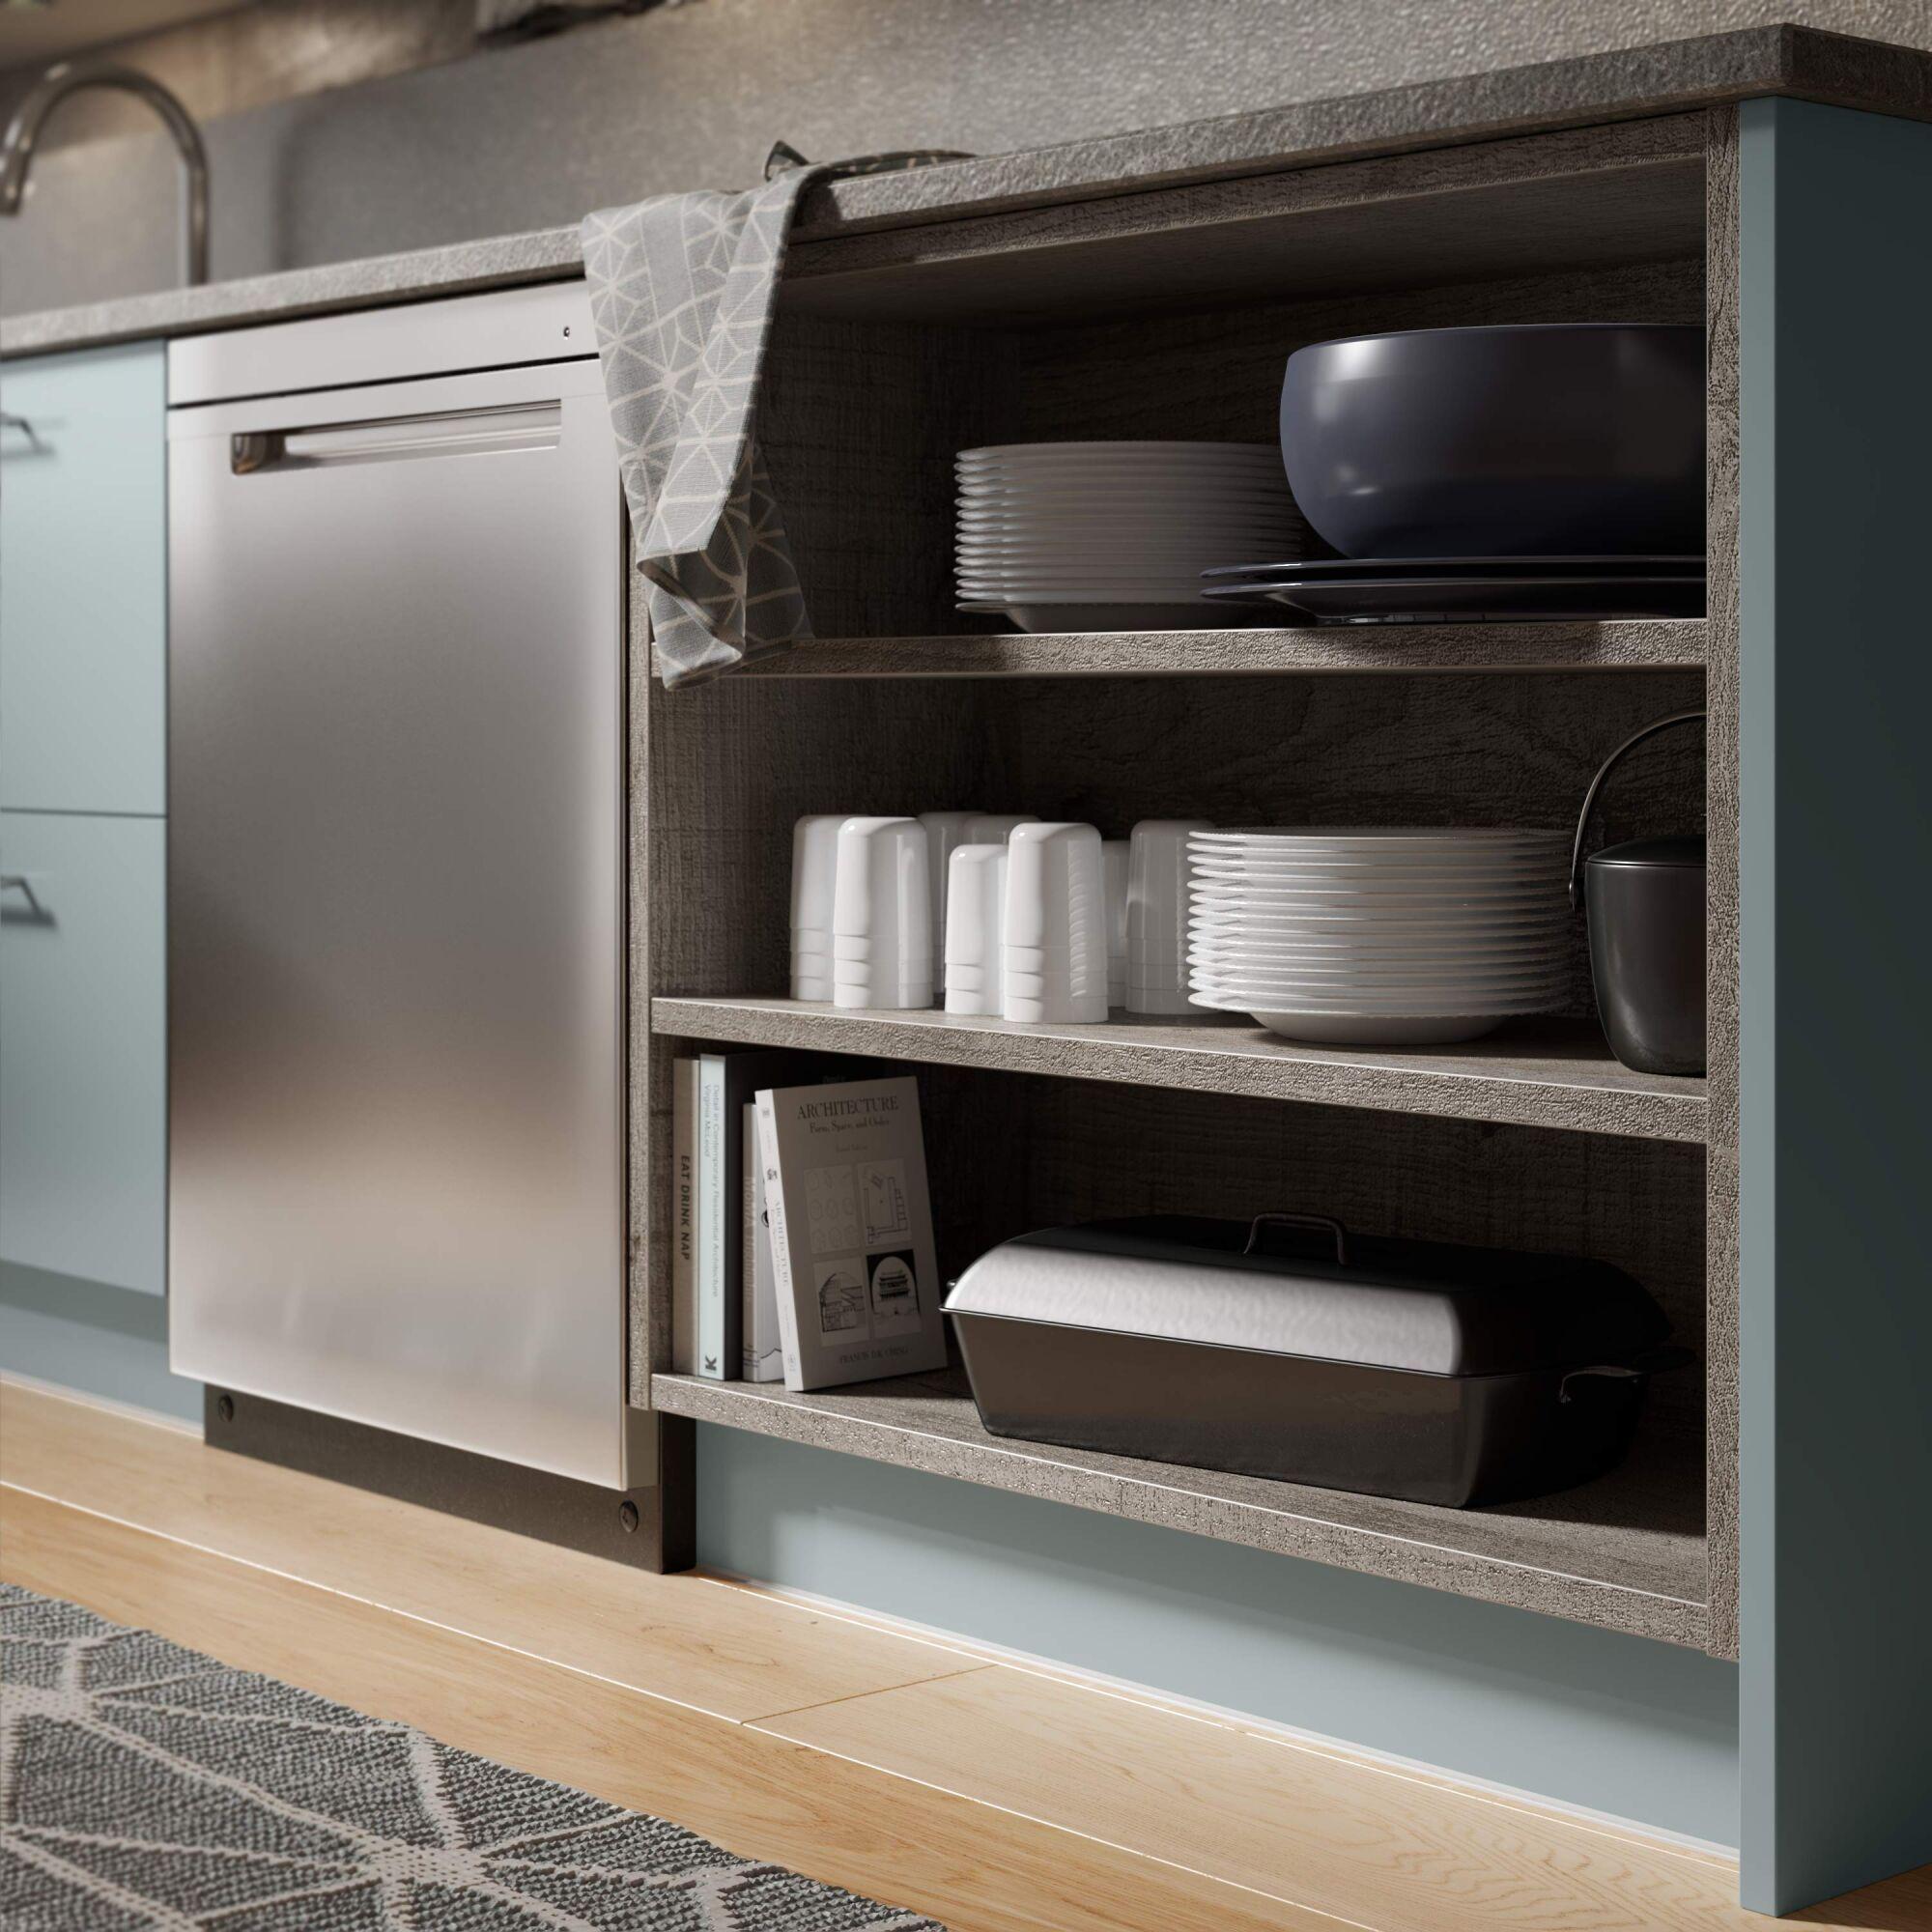 Ultra Kitchen in Cloud Blue